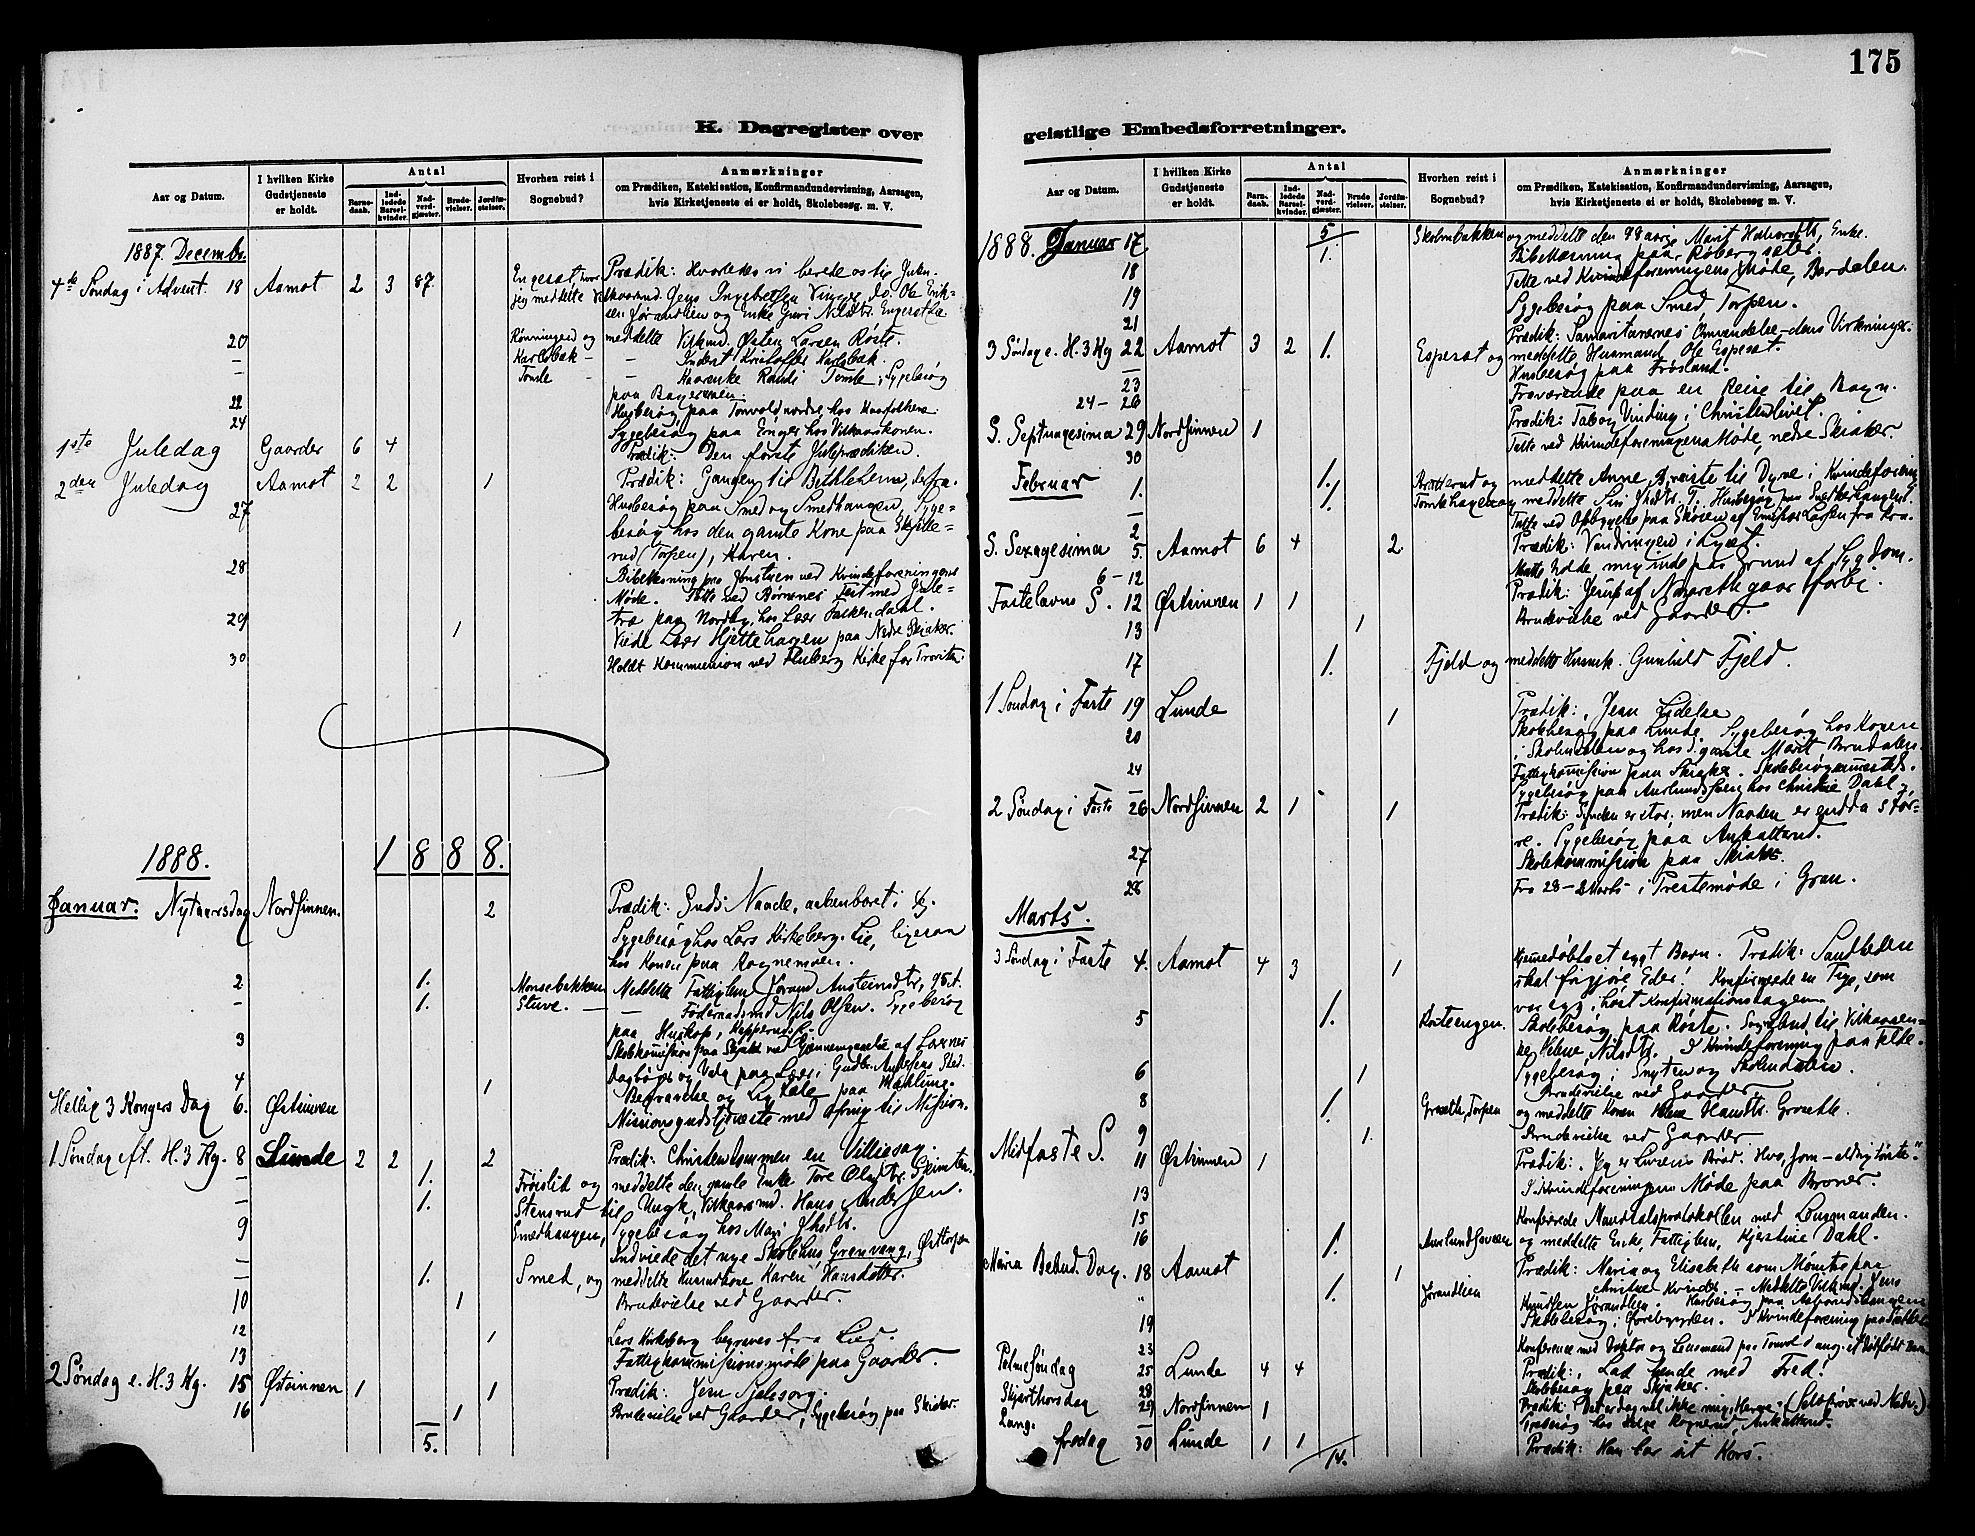 SAH, Nordre Land prestekontor, Ministerialbok nr. 3, 1882-1896, s. 175